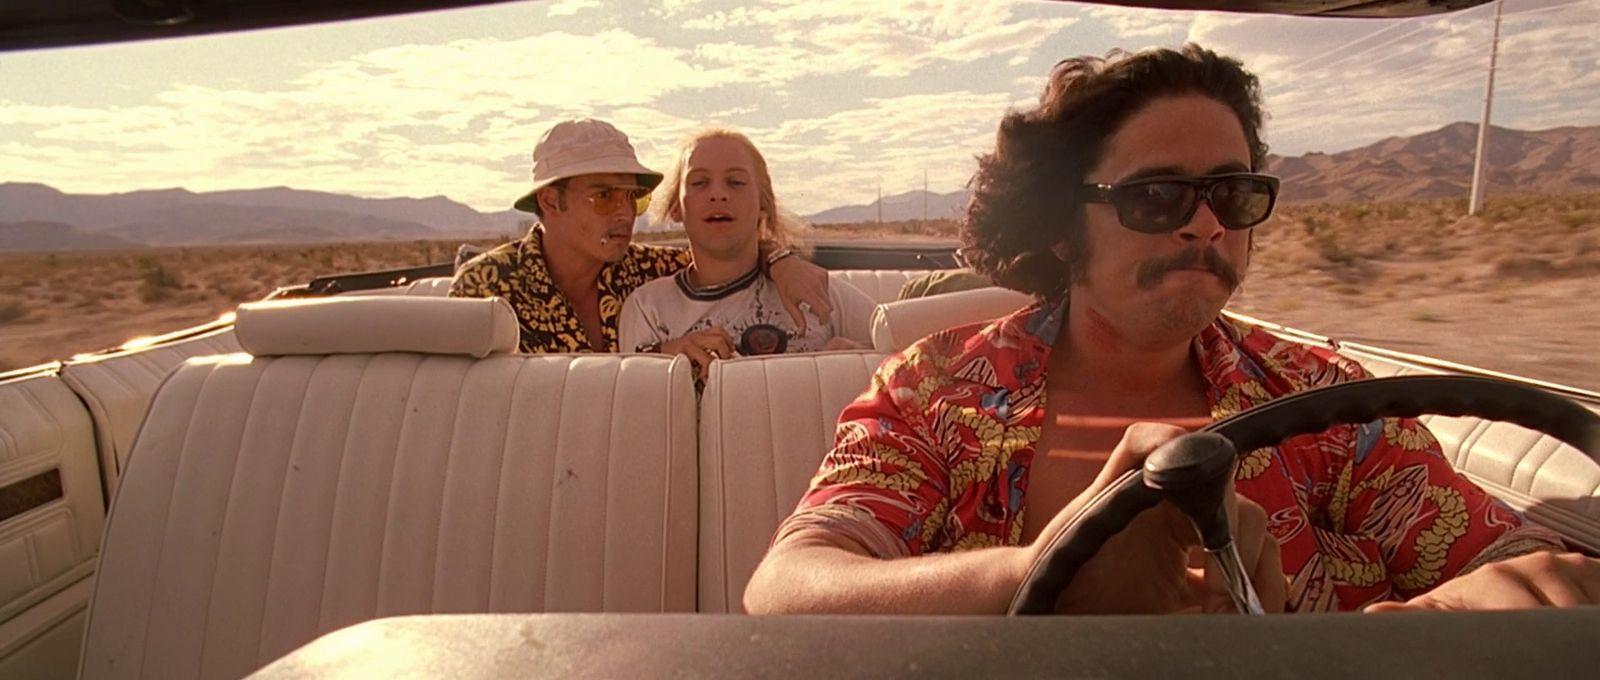 las vegas parano 1998 film de terry gilliam avec johnny depp benicio del toro cin. Black Bedroom Furniture Sets. Home Design Ideas